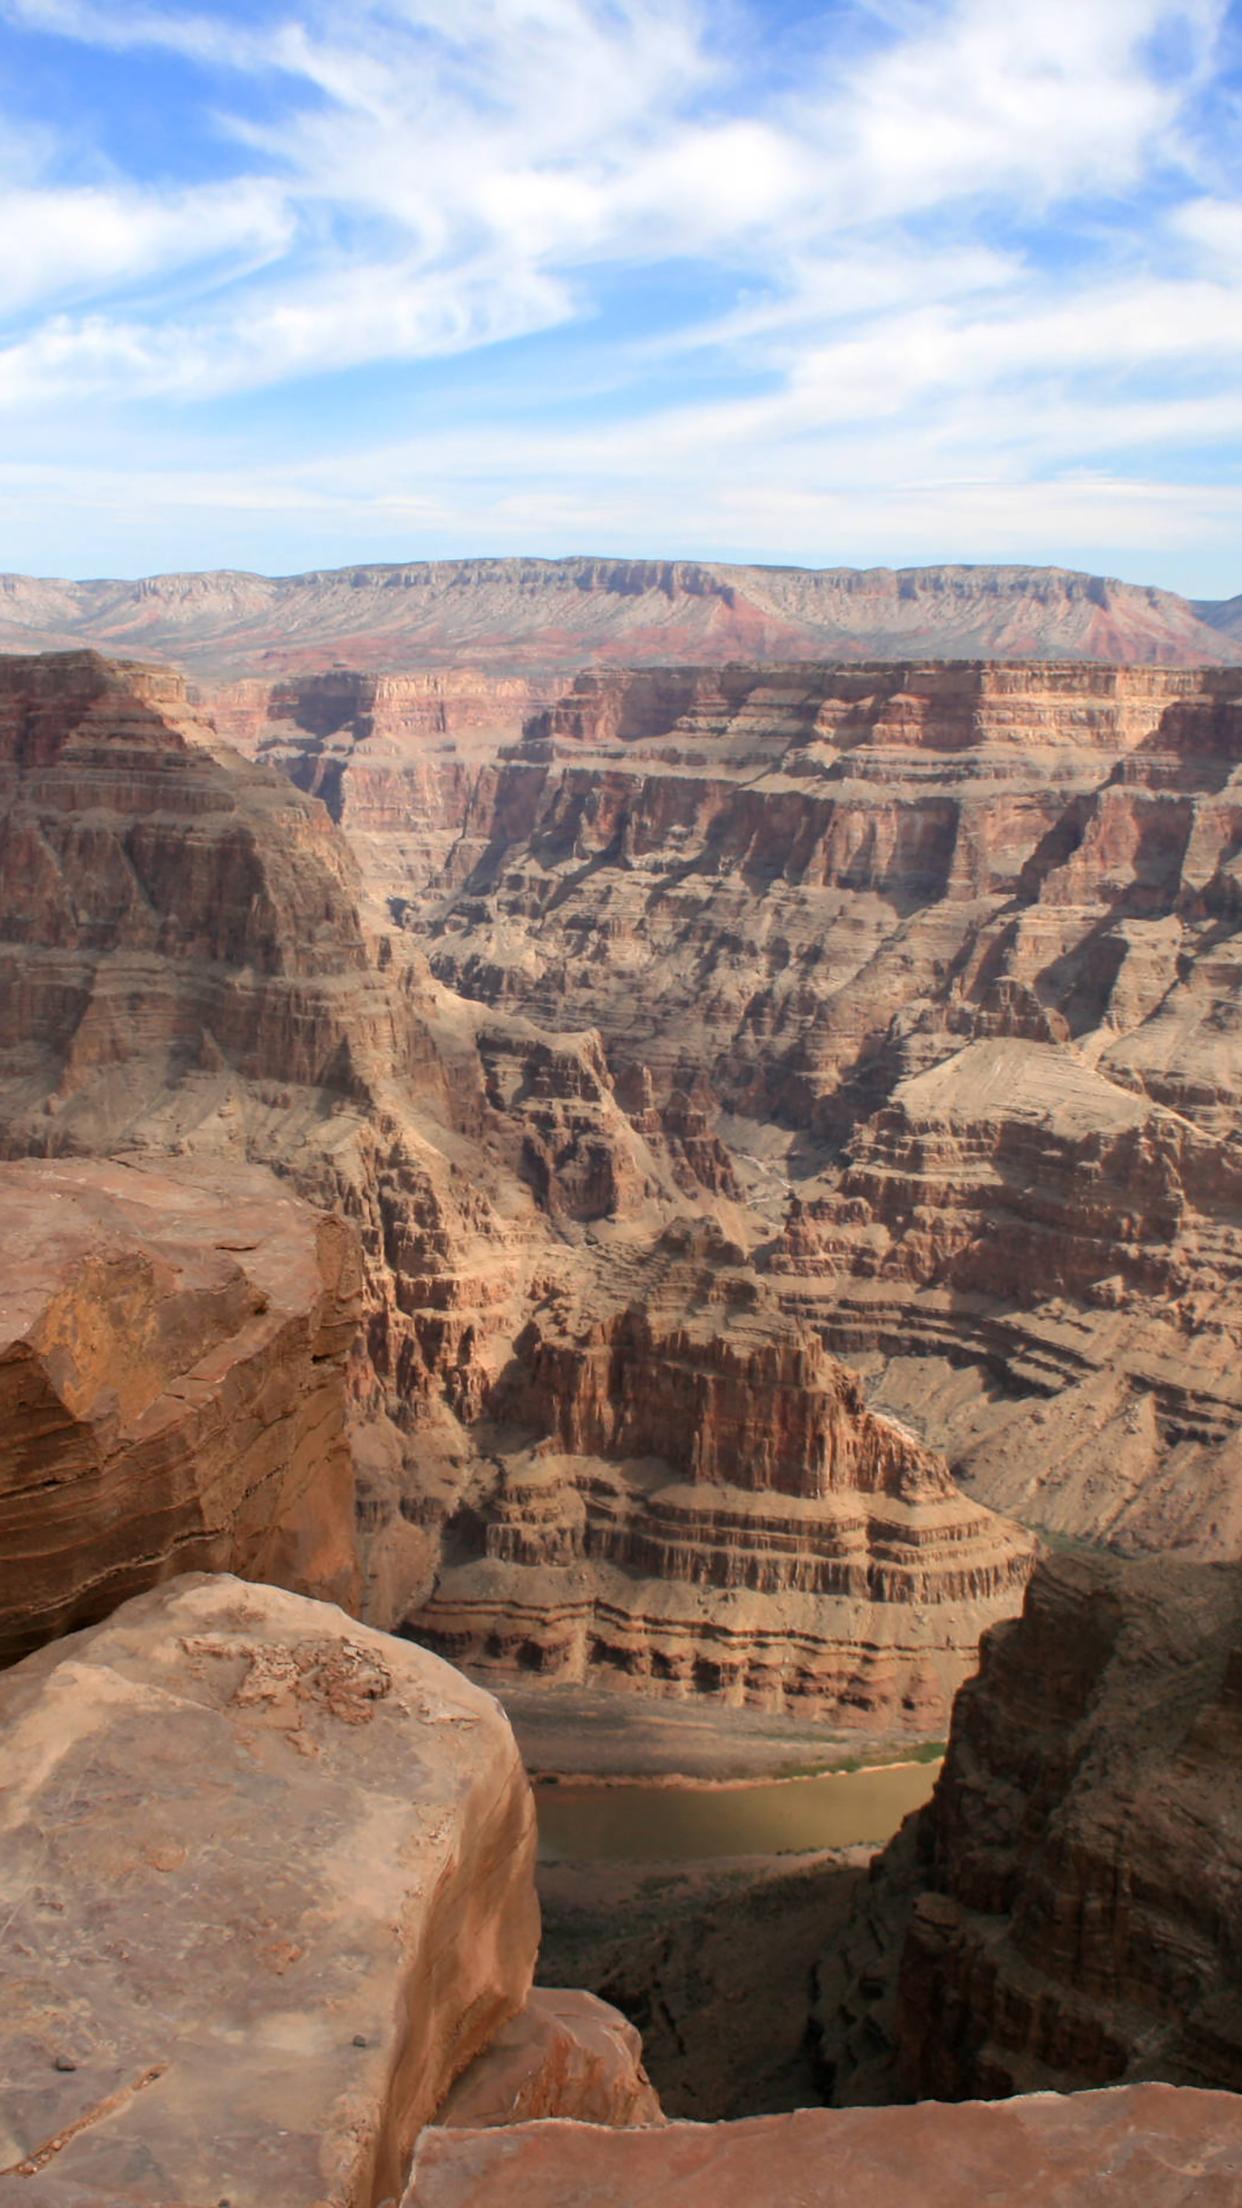 Canyon 1 3Wallpapers iPhone Parallax Canyon : 1